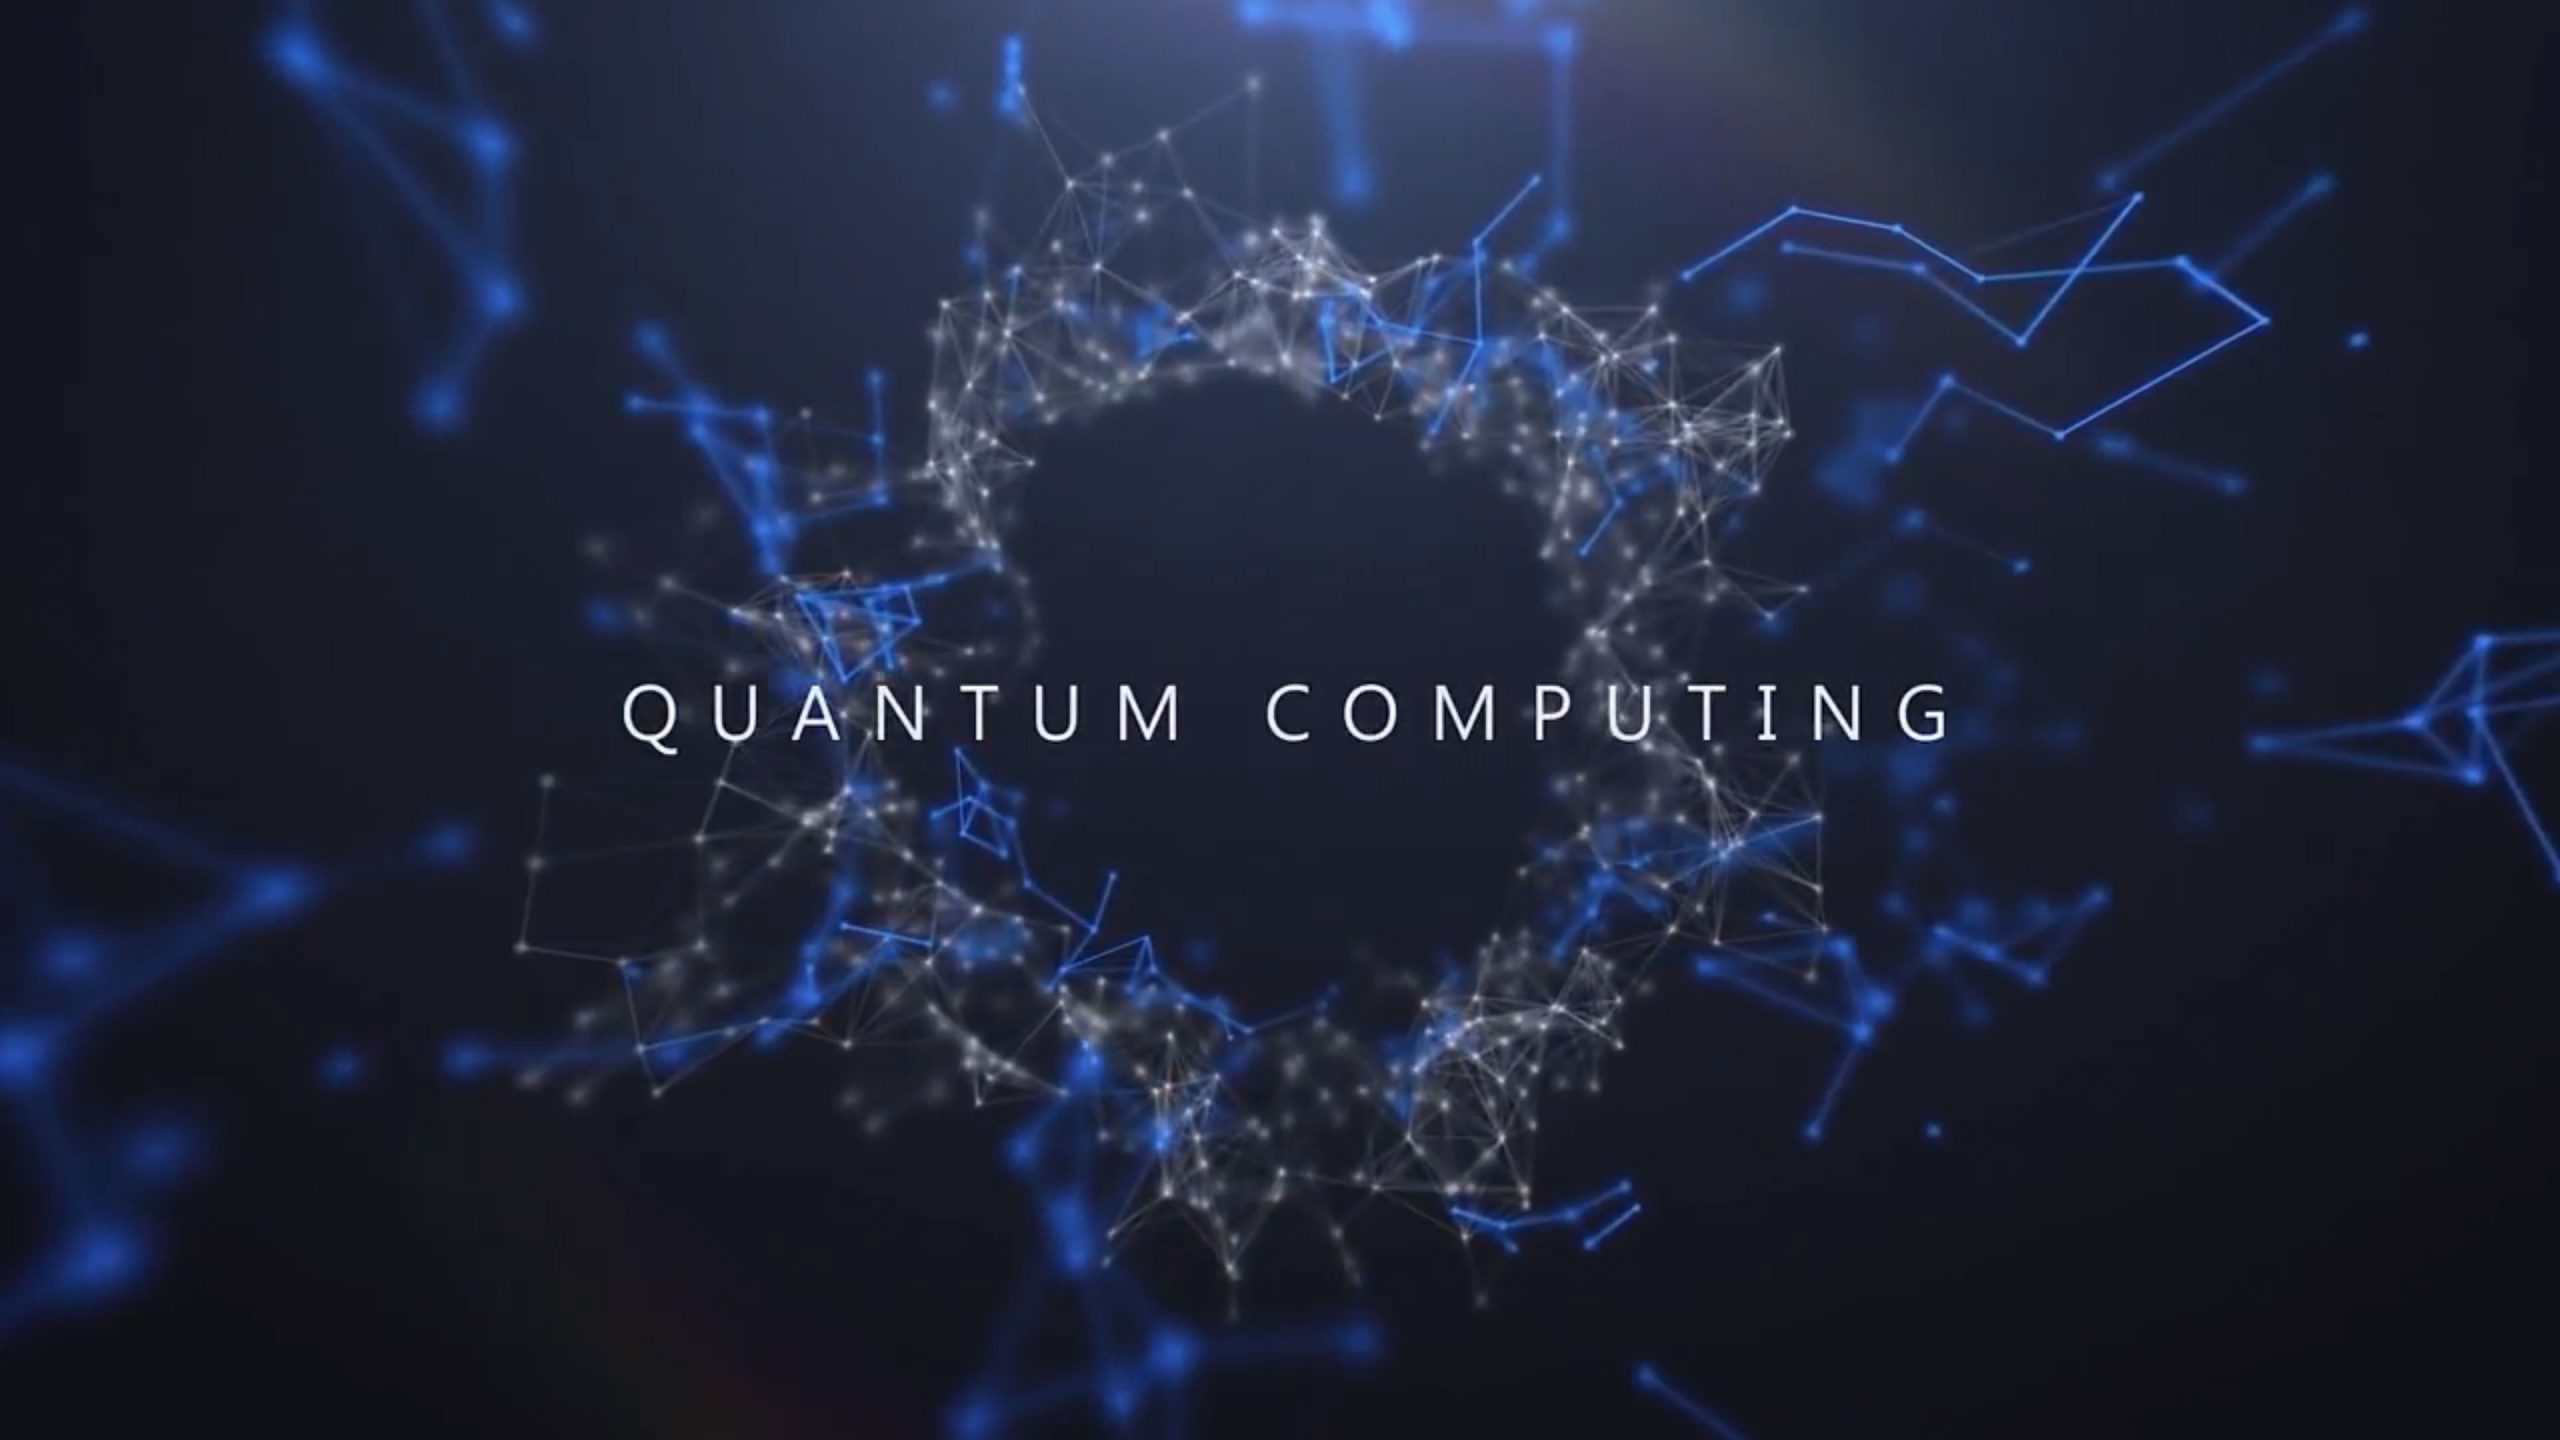 quantum computing wallpaper